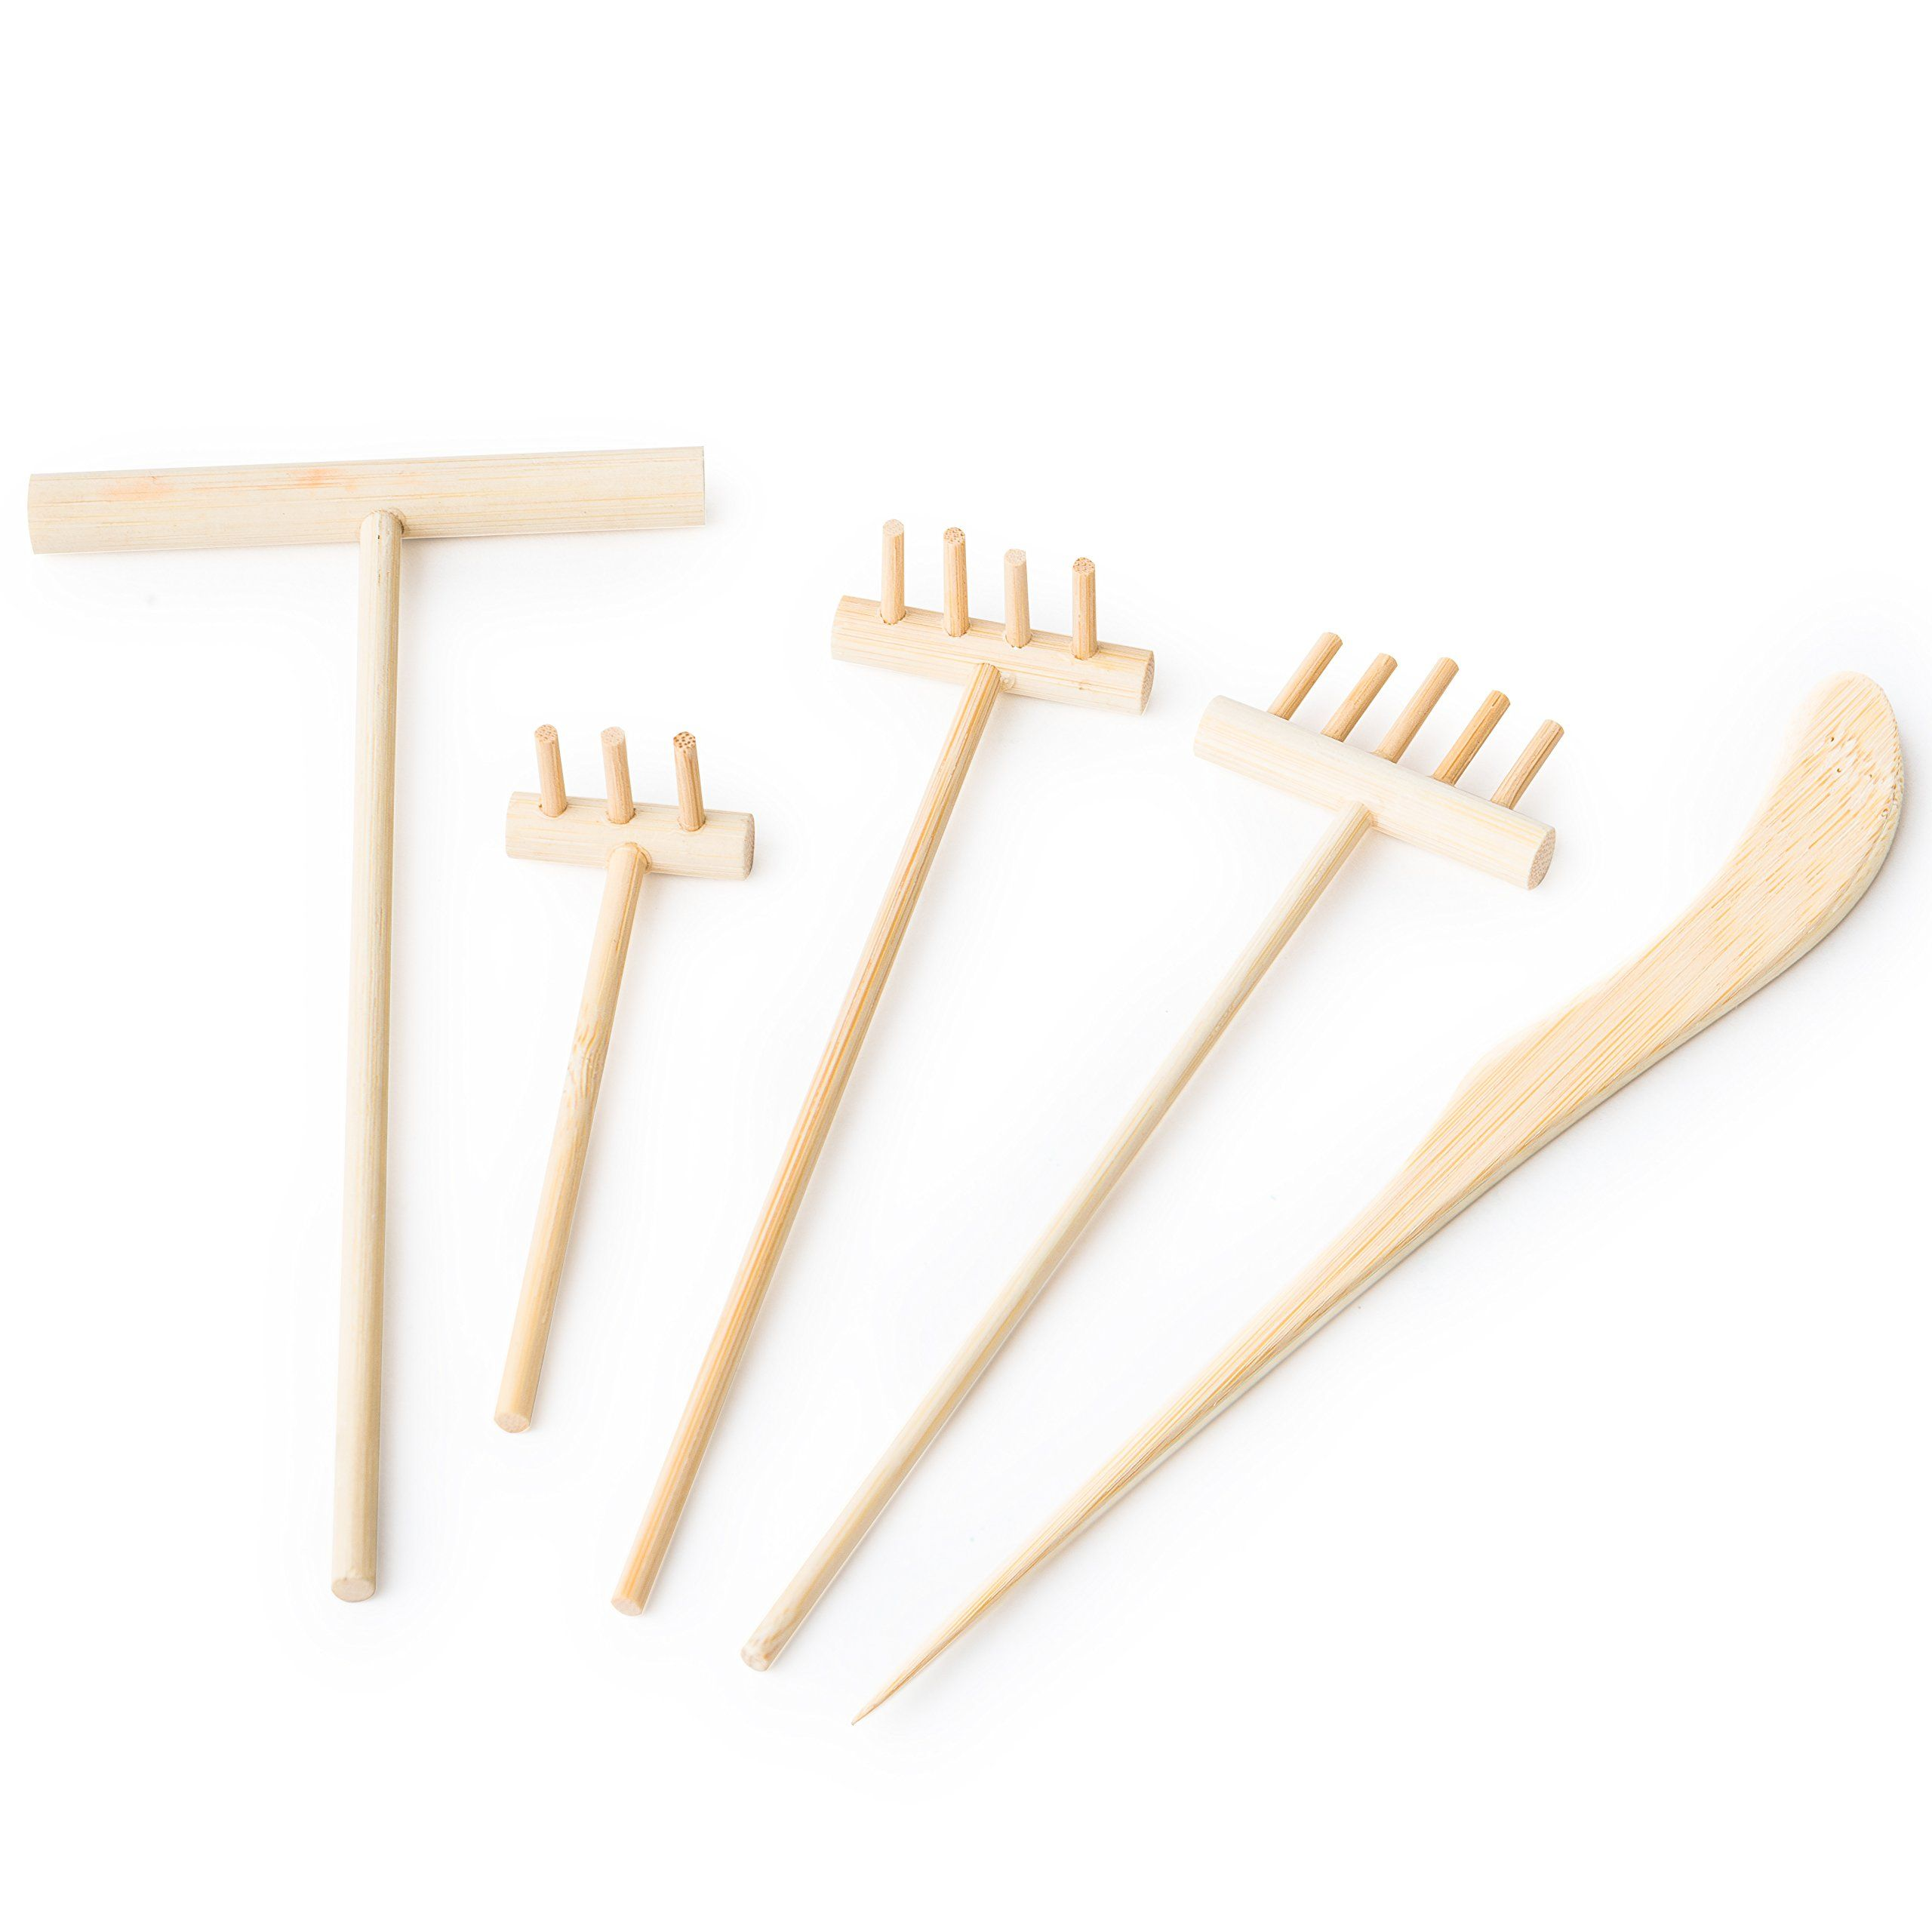 Mini Zen Garden Rake Set: 5 Small Bamboo Rakes For Desktop Or Tabletop  Japanese Sand Garden   Miniature Meditation Sandbox Accessories: Three, ...